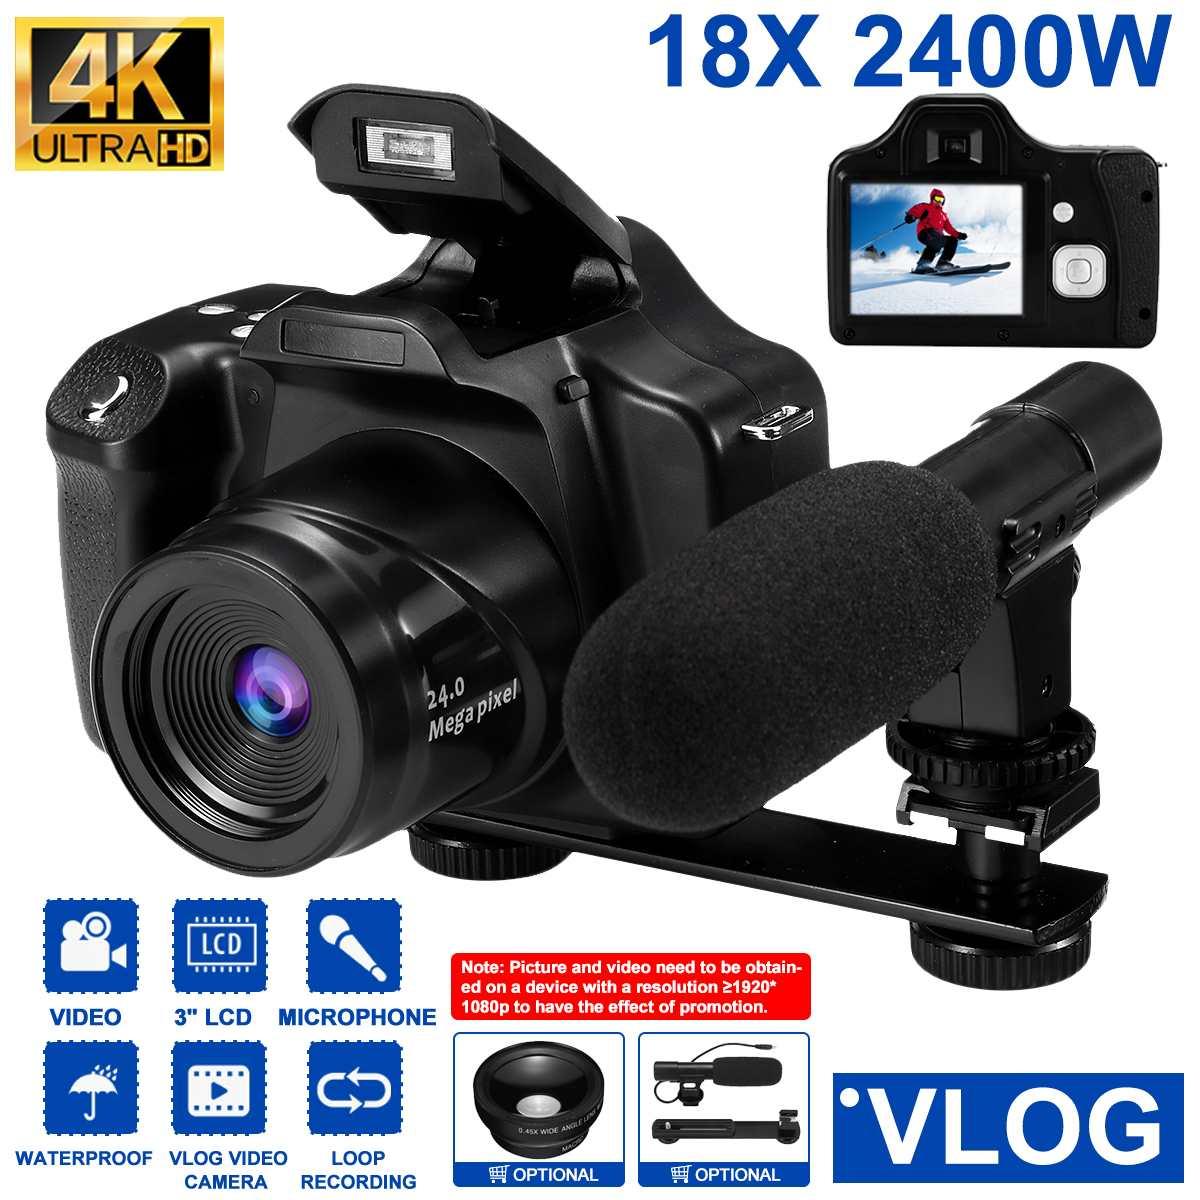 30 MP 4K Professional HD Camcorder vlog Video Camera Night Vision Touch Screen Camera 18X Digital Zo